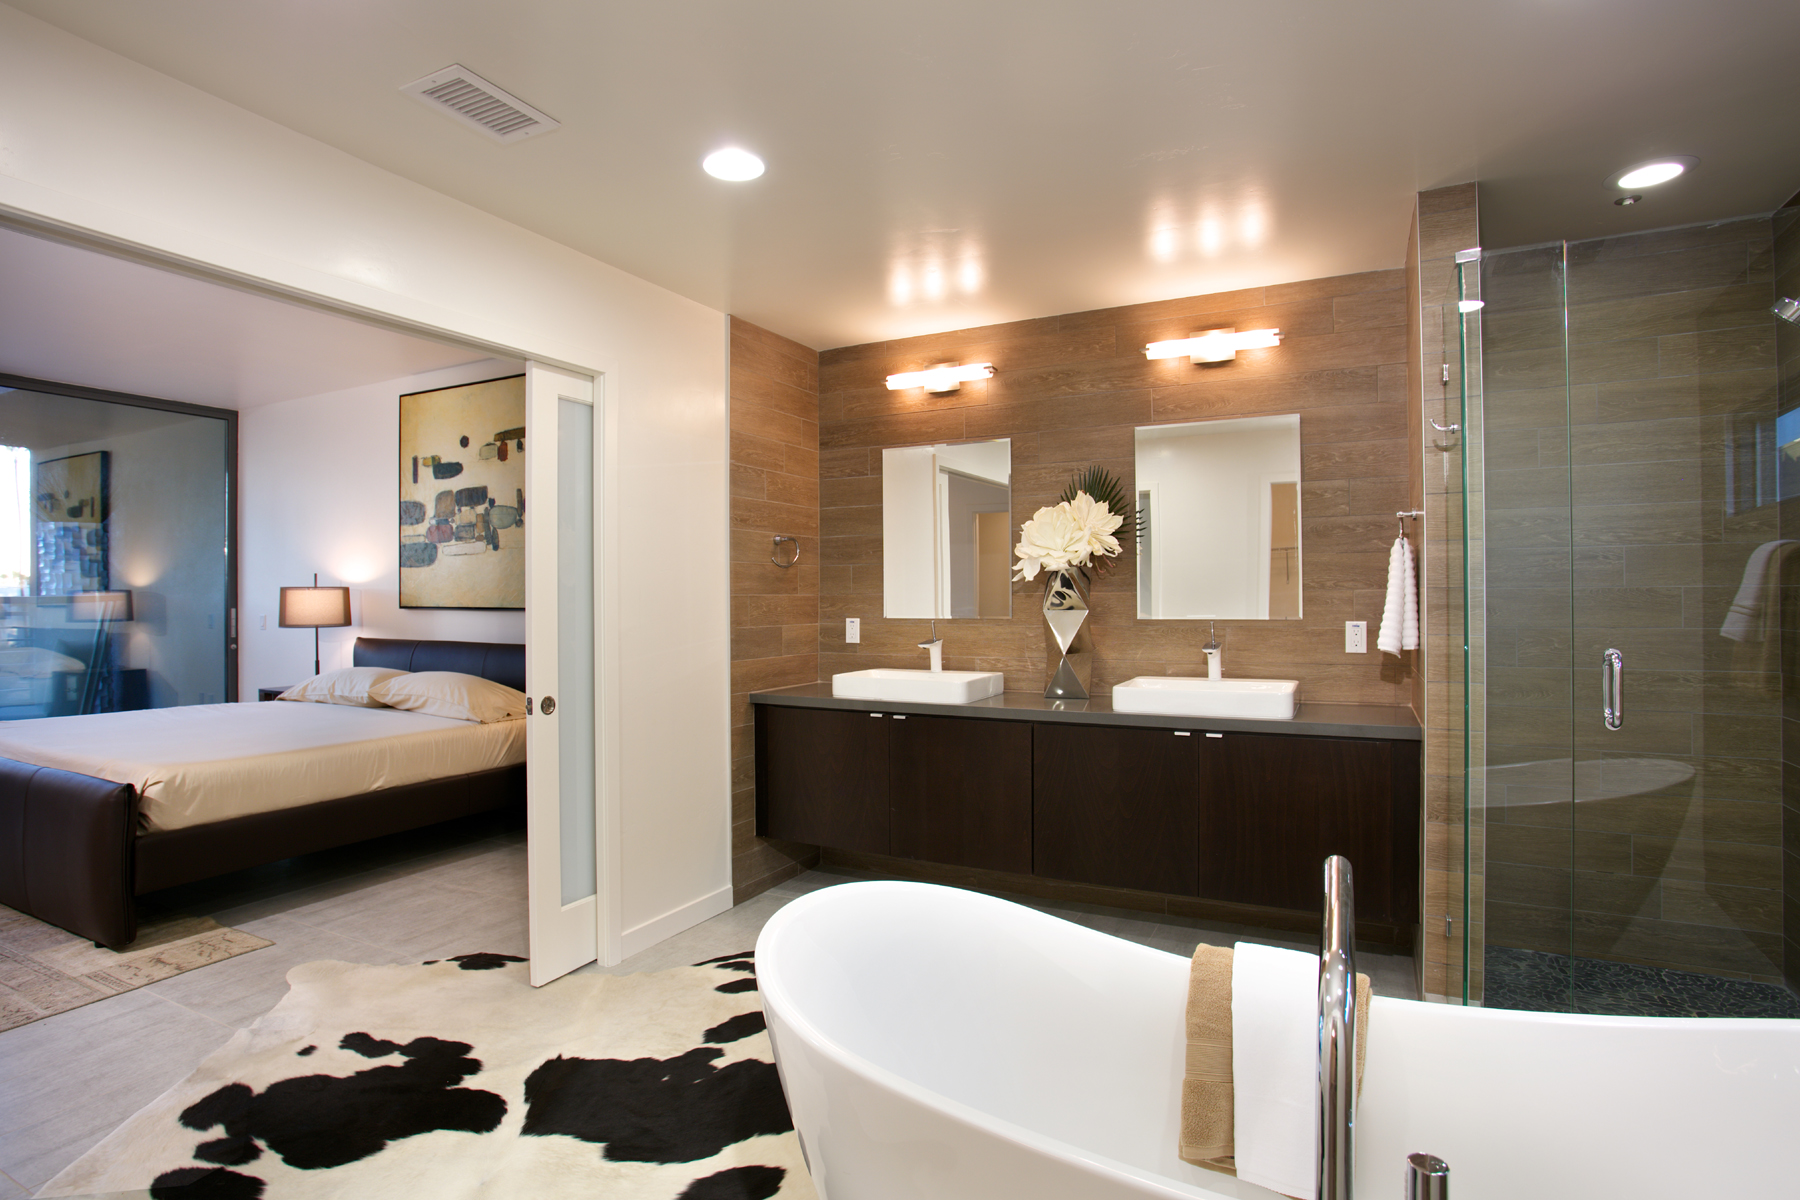 19-3871_16_Interior Bath.jpg